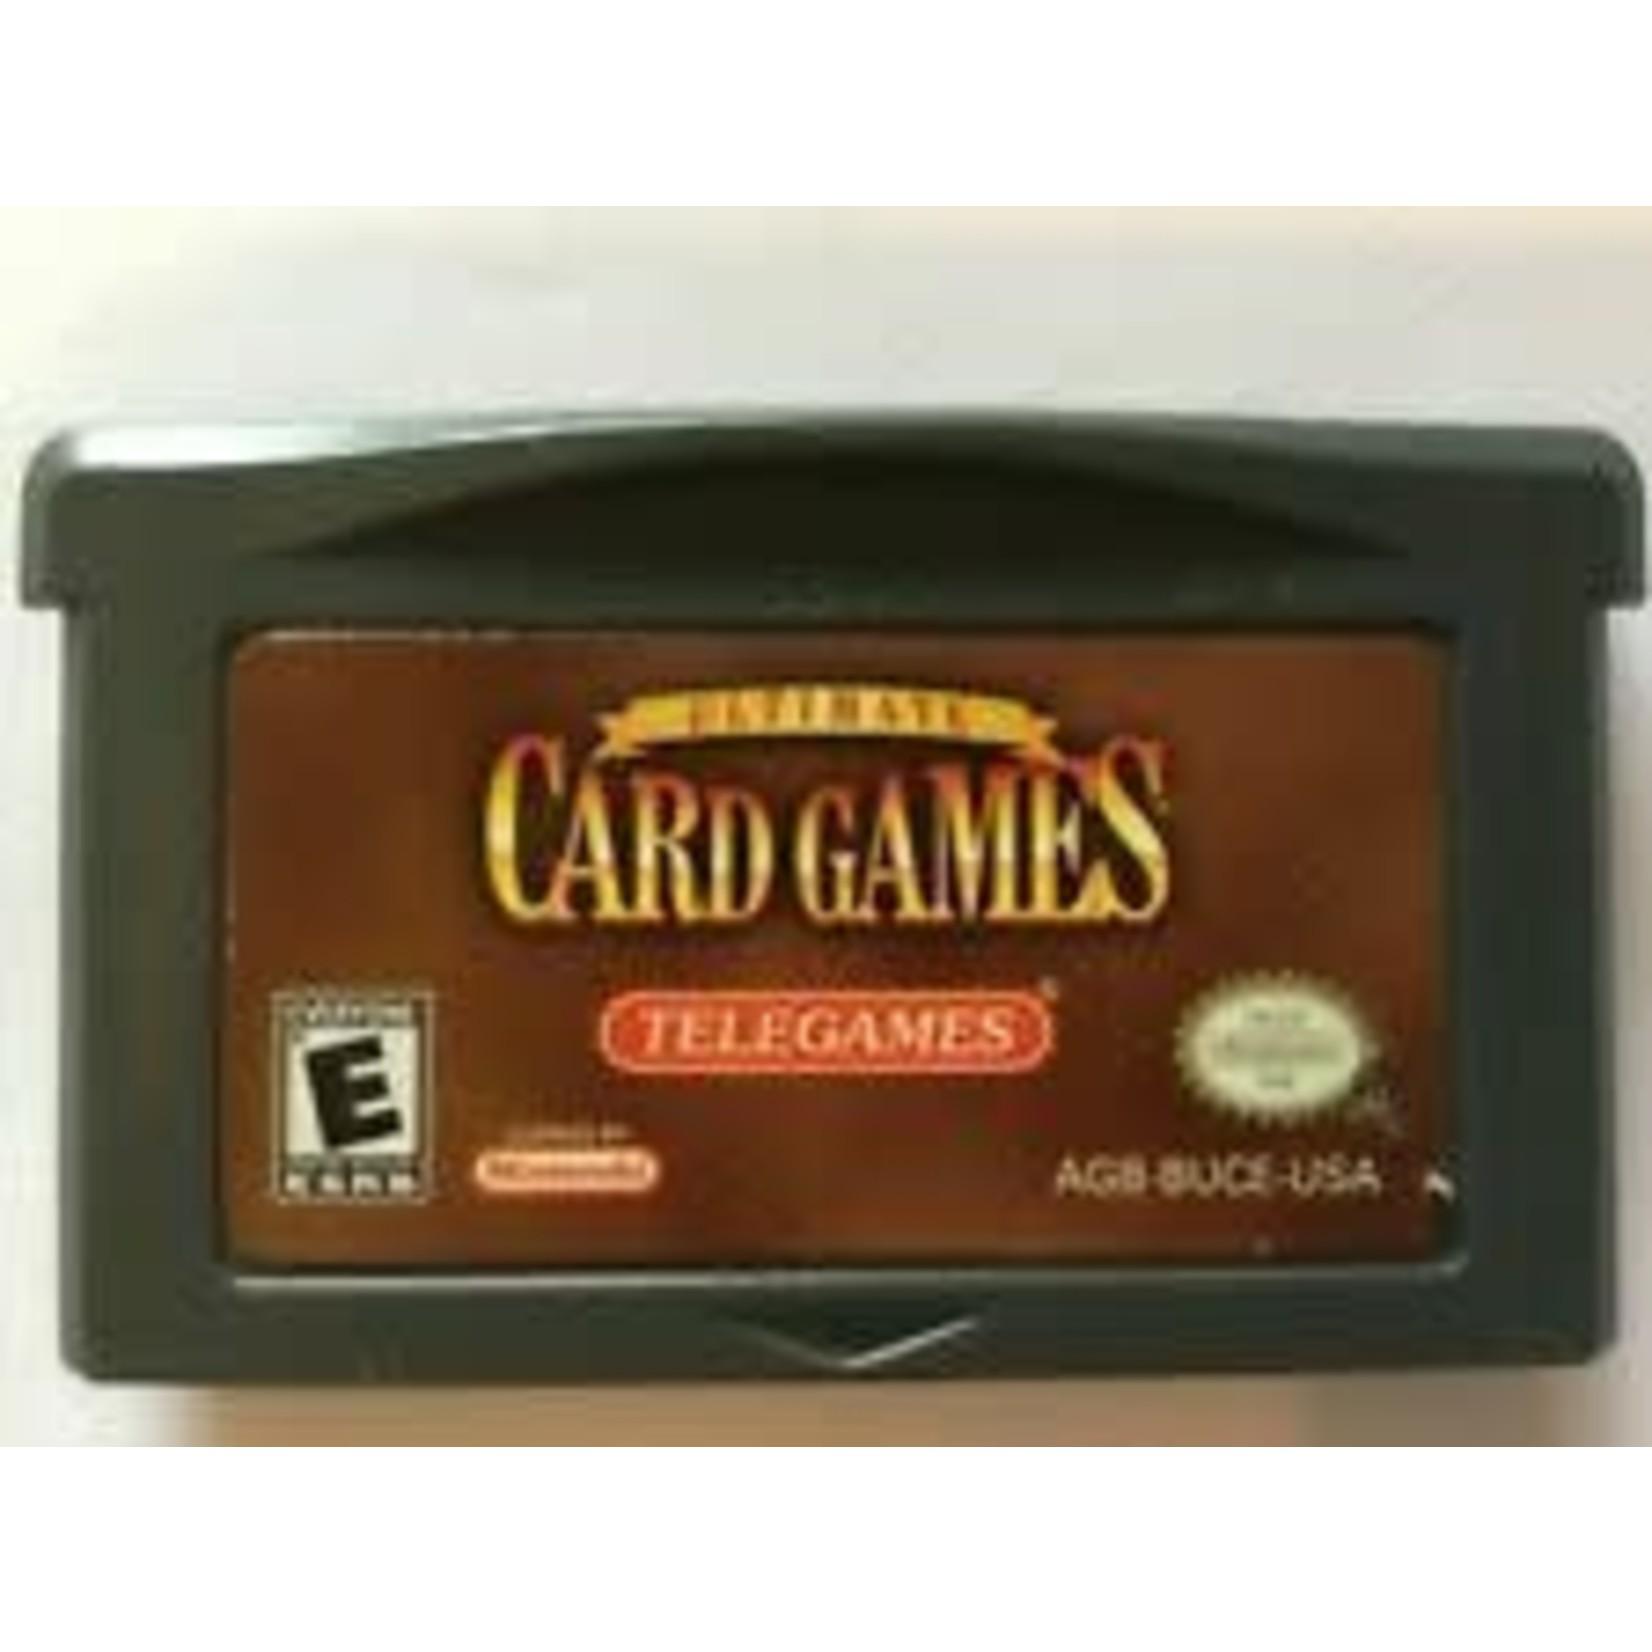 GBAU-Ultimate Card Games (CARTRIDGE)